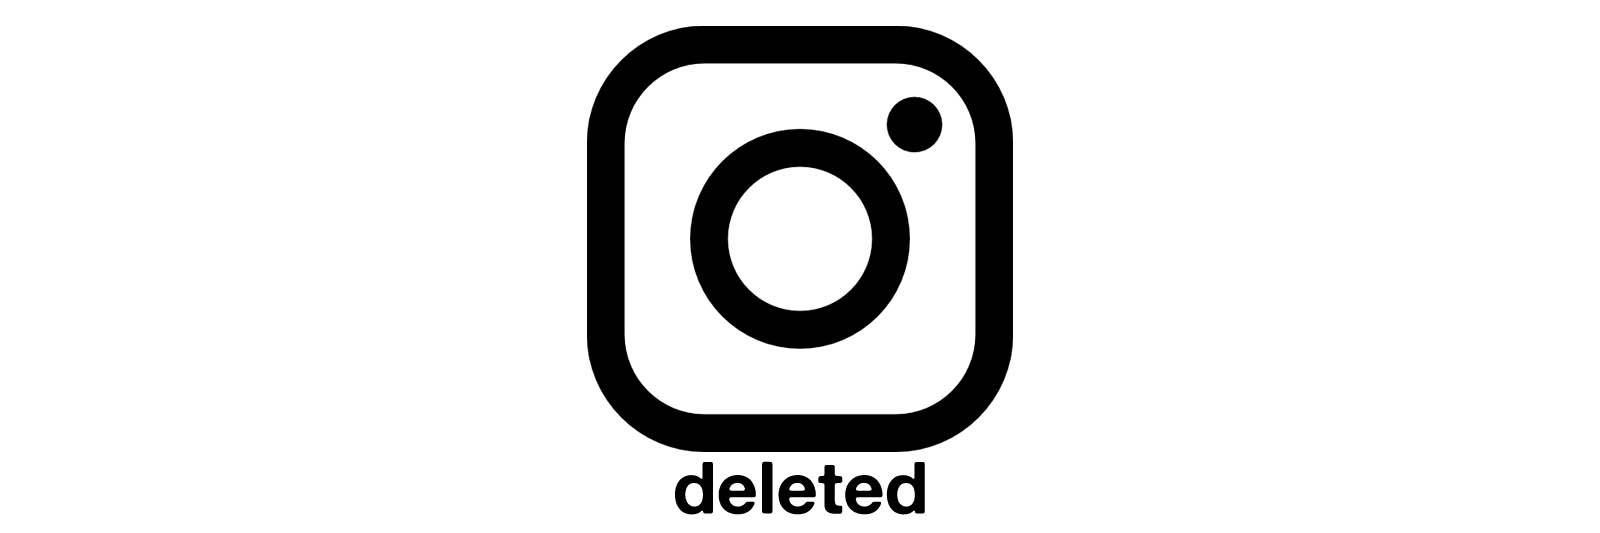 instagram-deleted